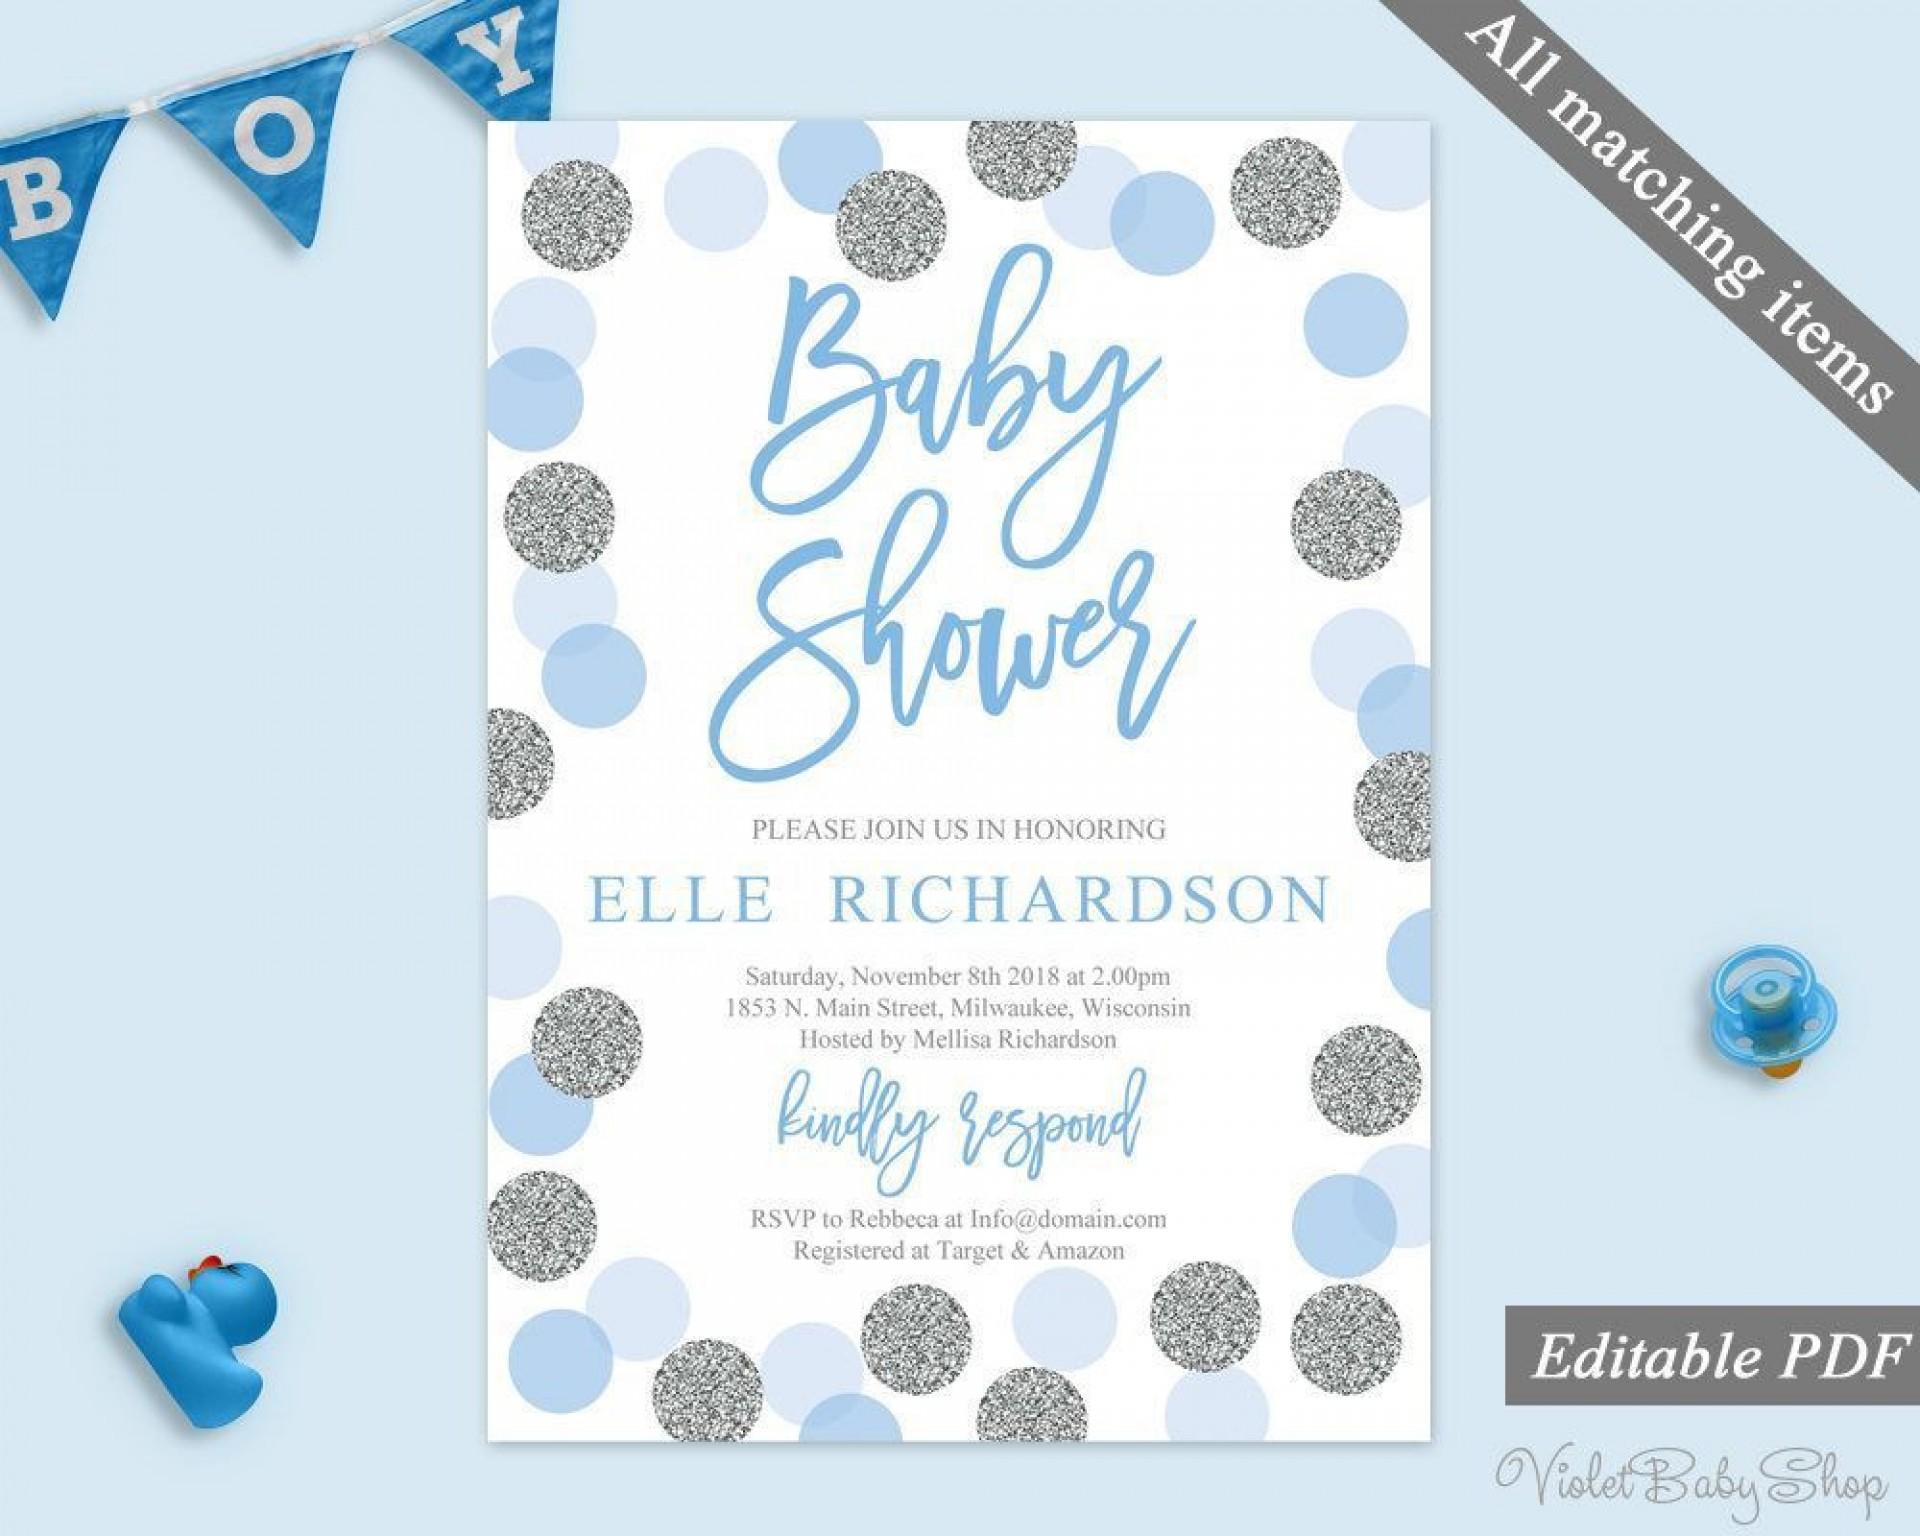 002 Imposing Baby Shower Invitation Template Microsoft Word Sample  Free Editable1920